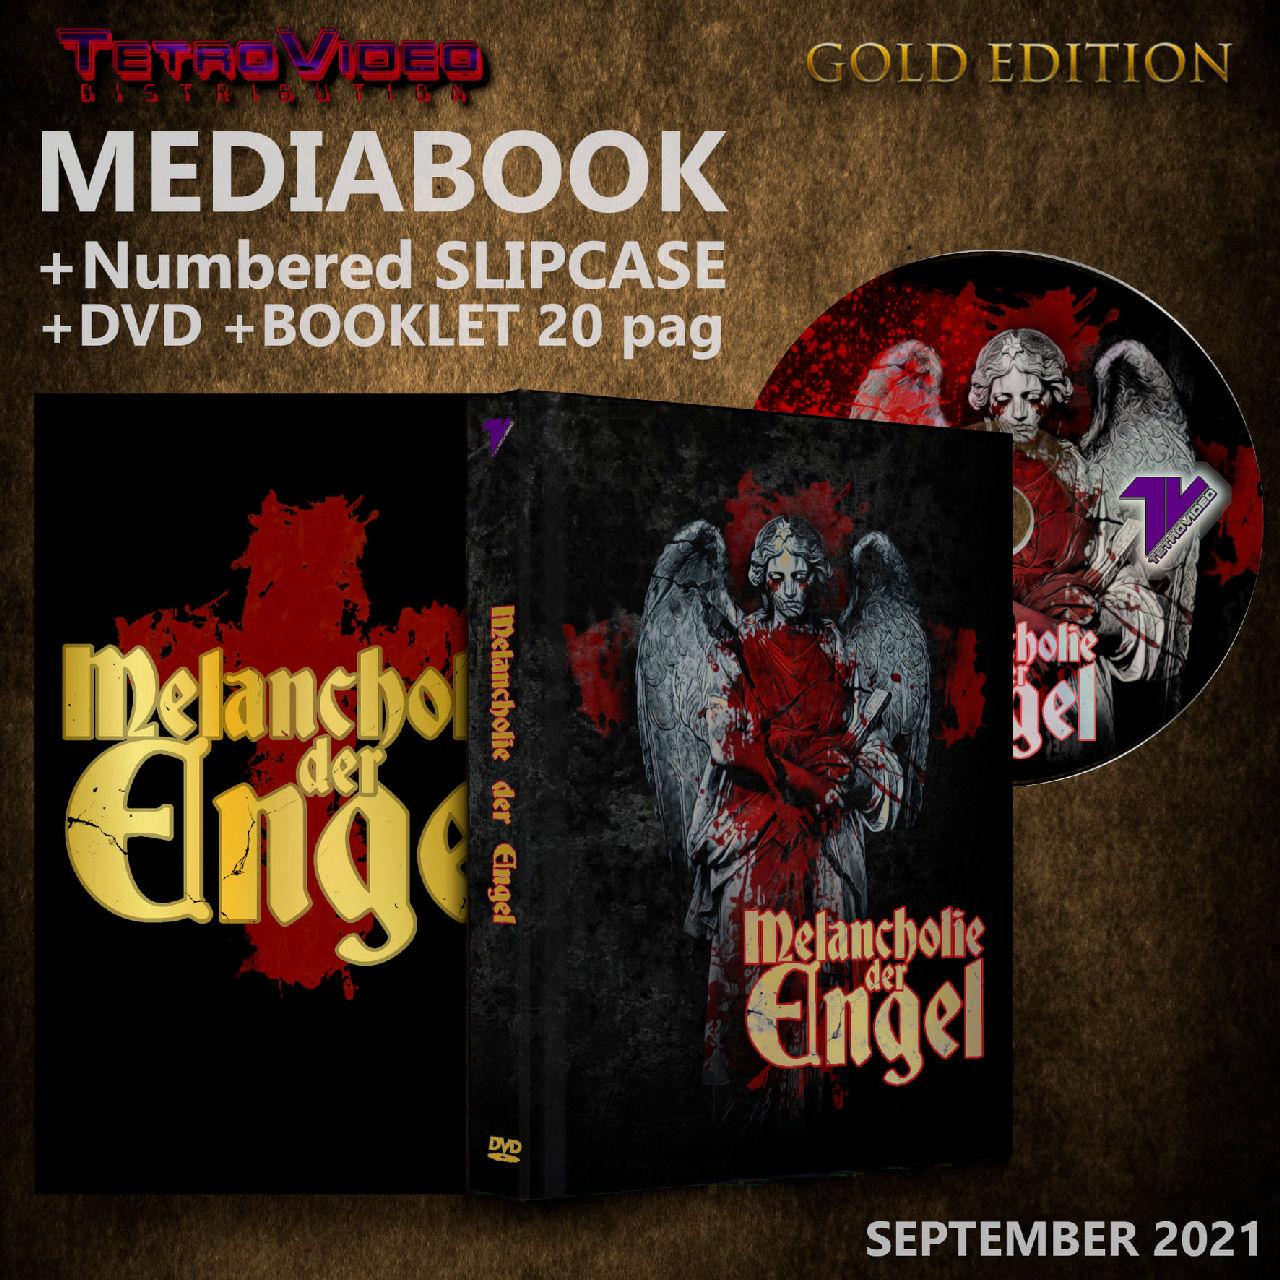 melancholie - der engel - dvd 2 tetrovideo